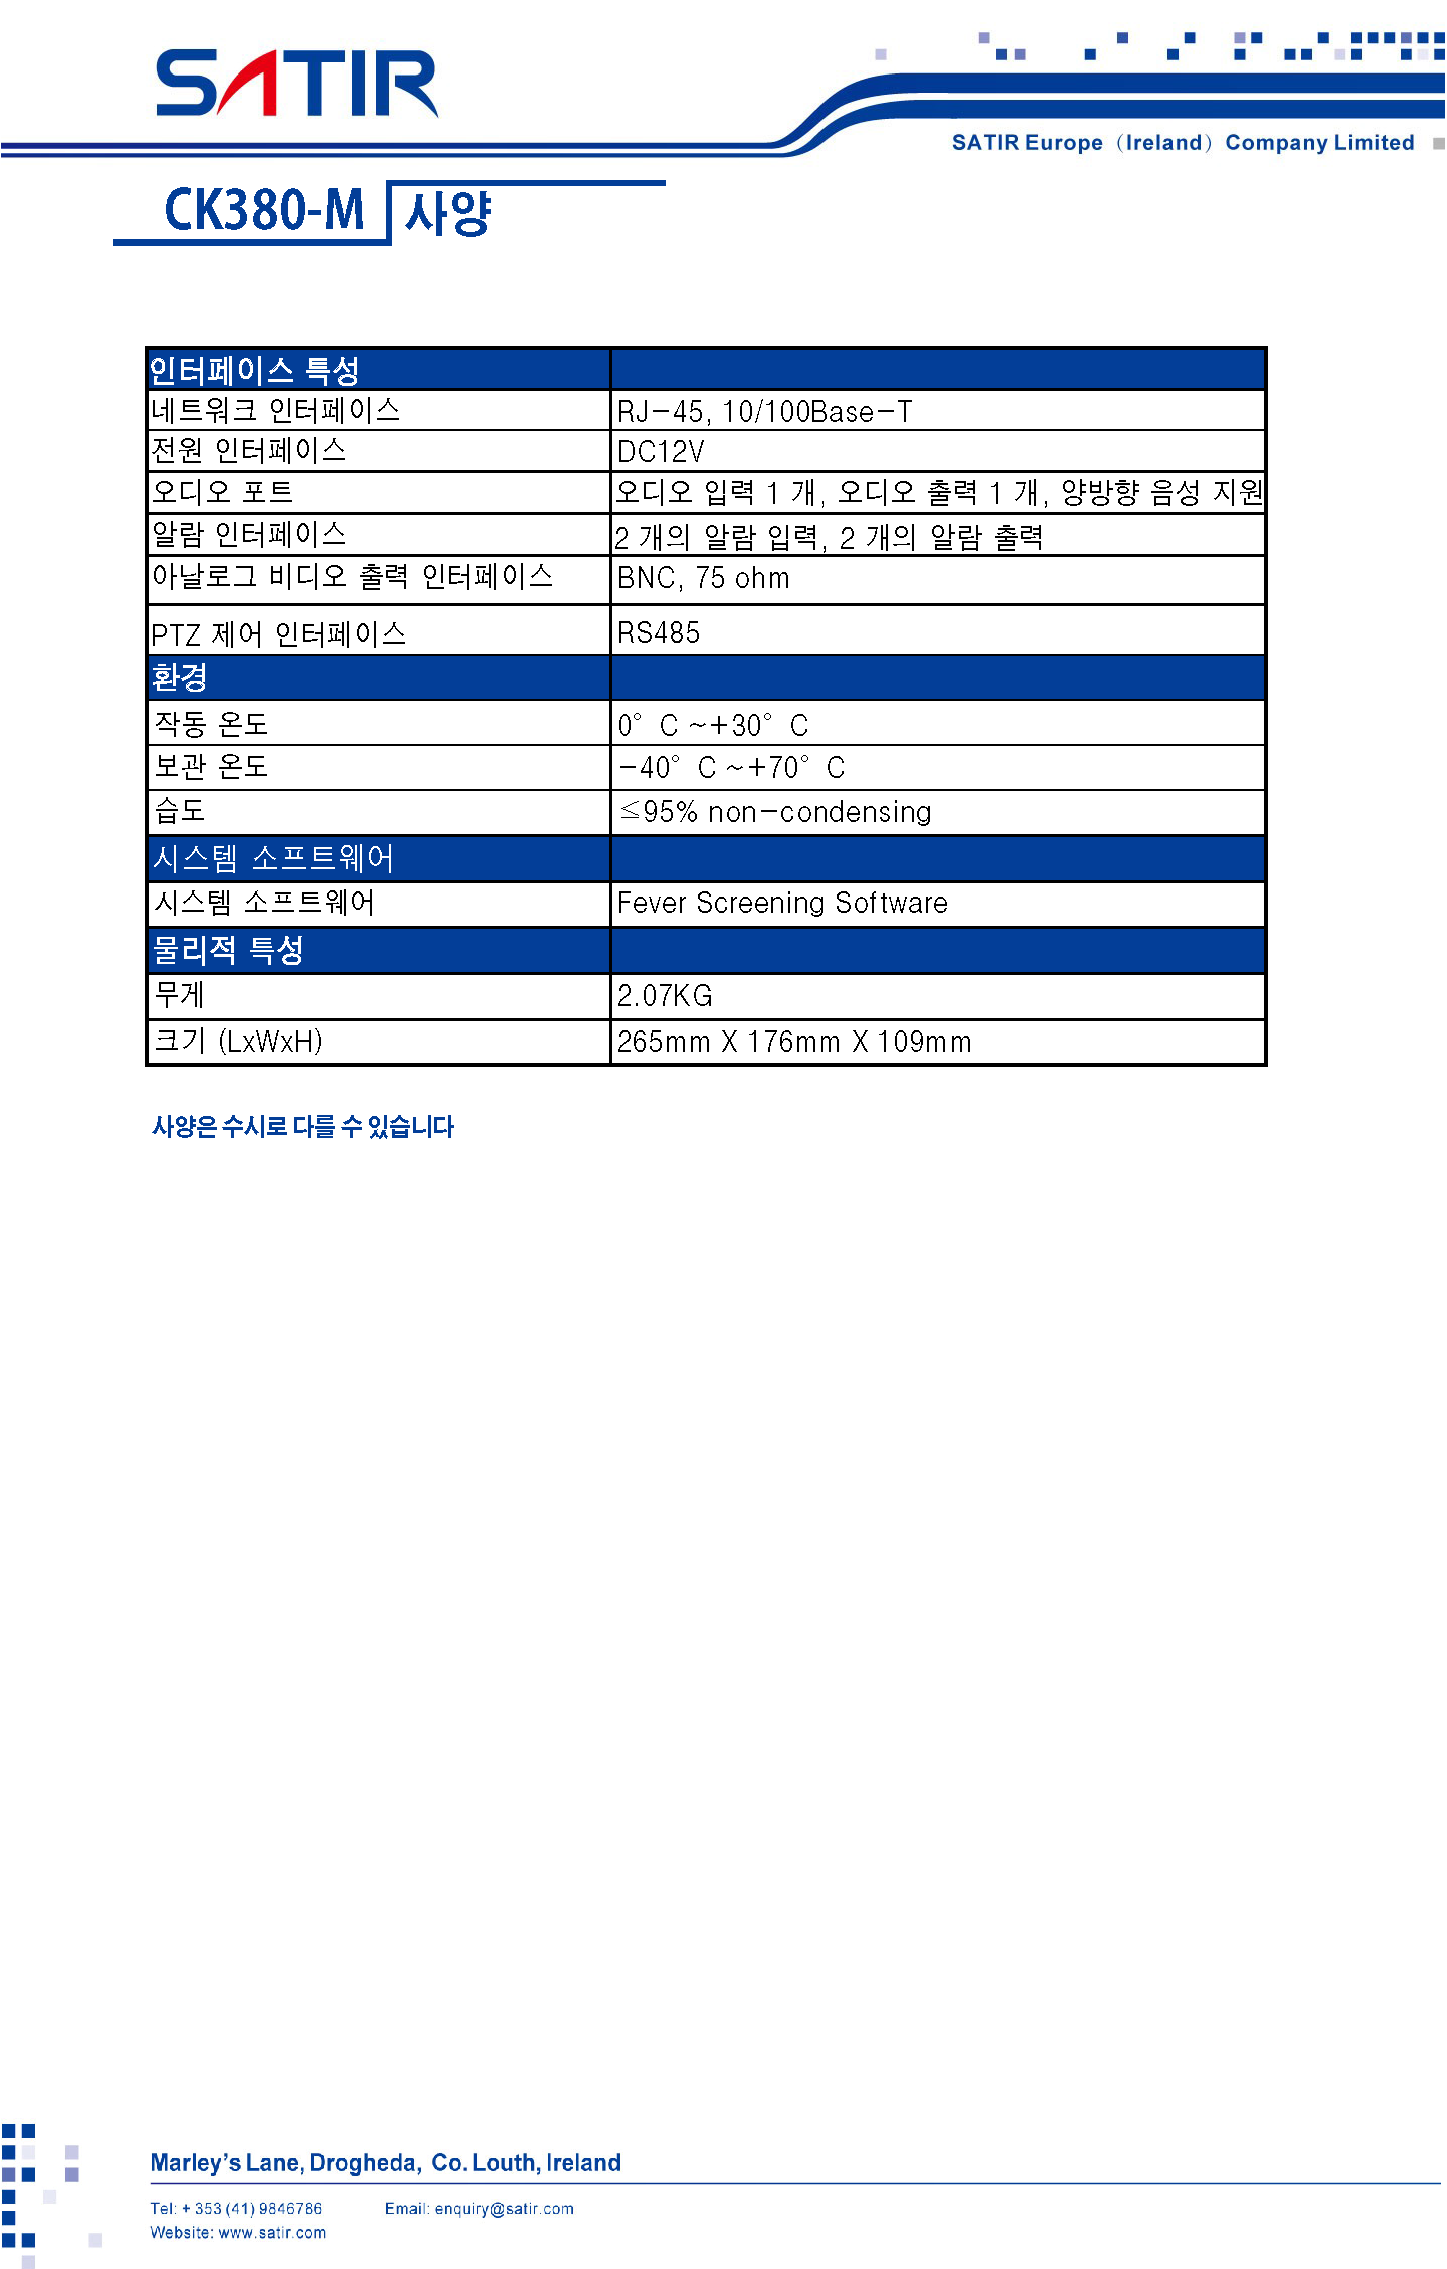 ck380m-v1-fever-screening 스펙 한글_페이지_3.png